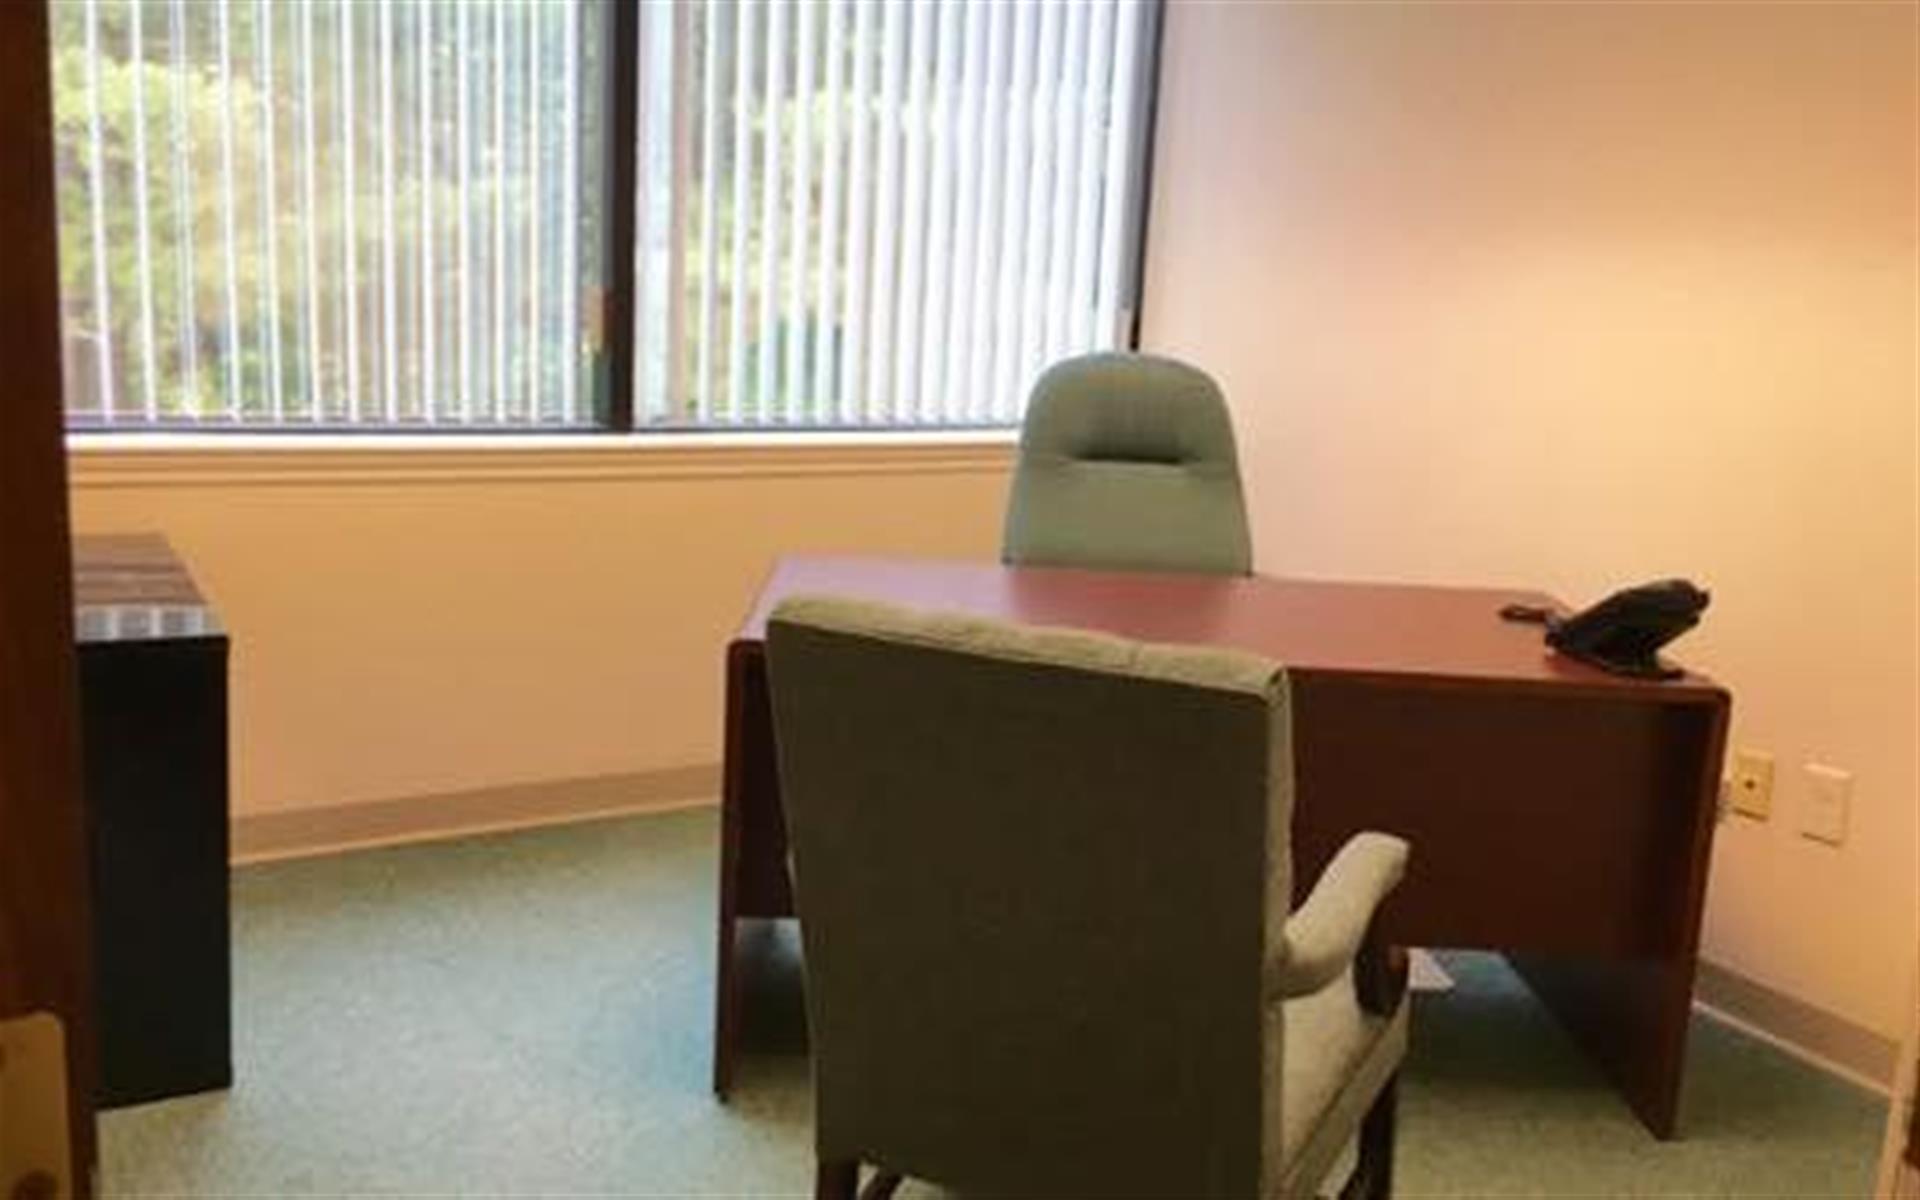 CEO Nashua, Inc. - Office # 31